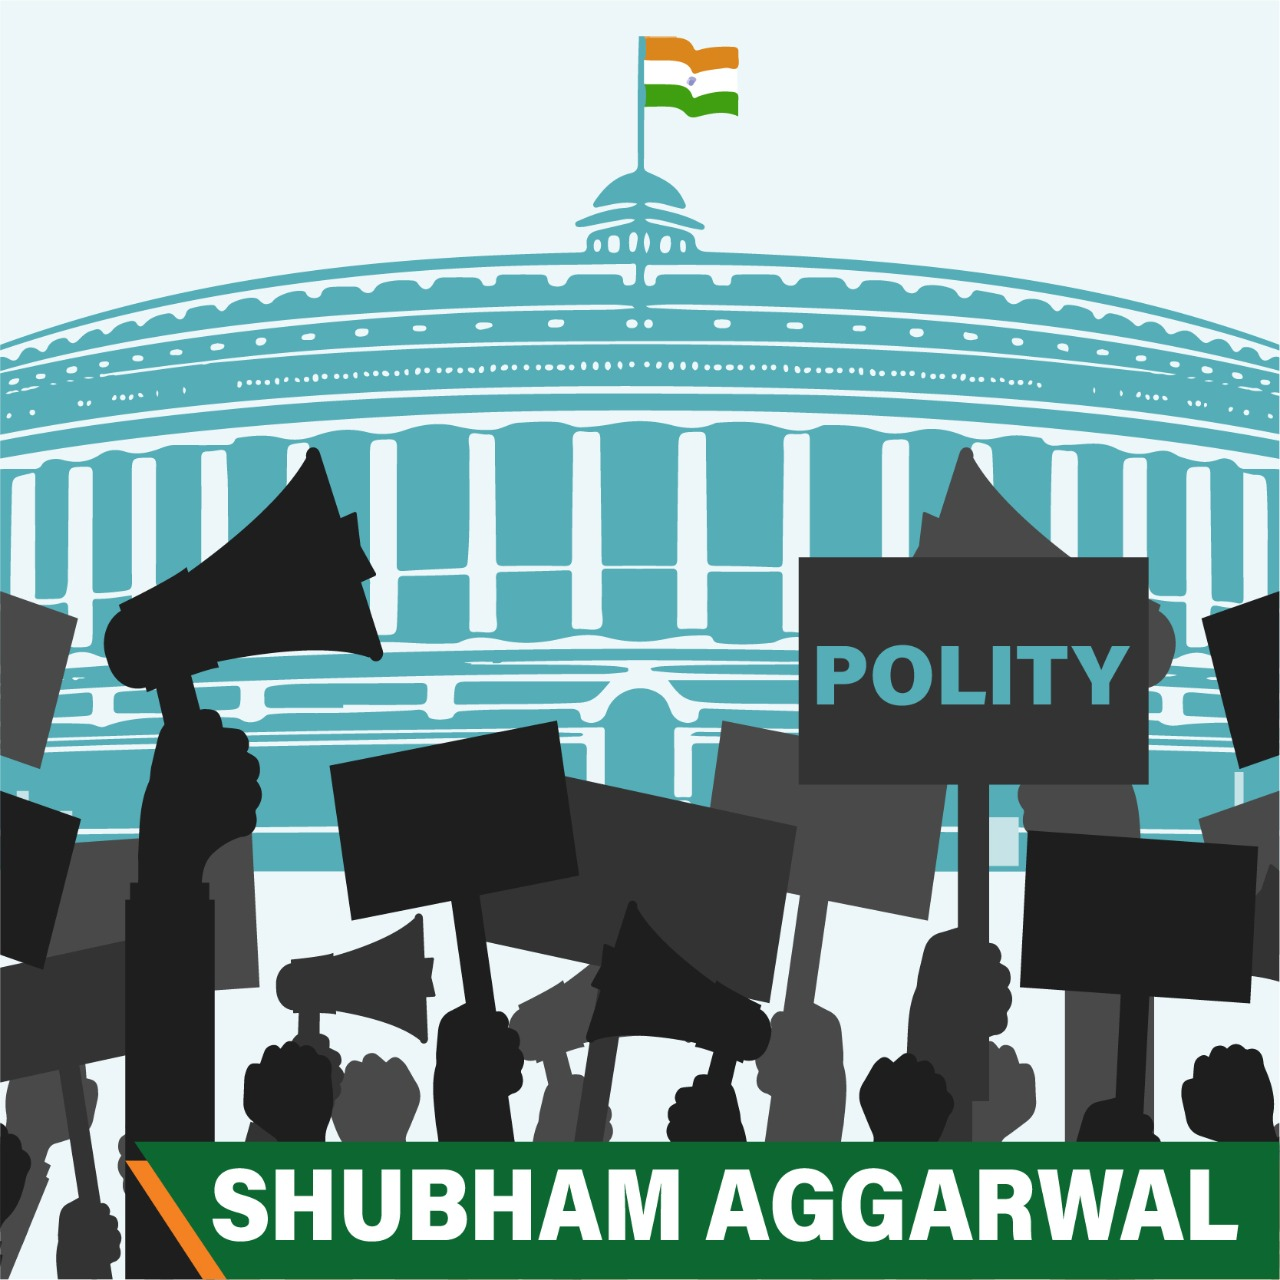 Shubham Aggarwal - INDIAN POLITY